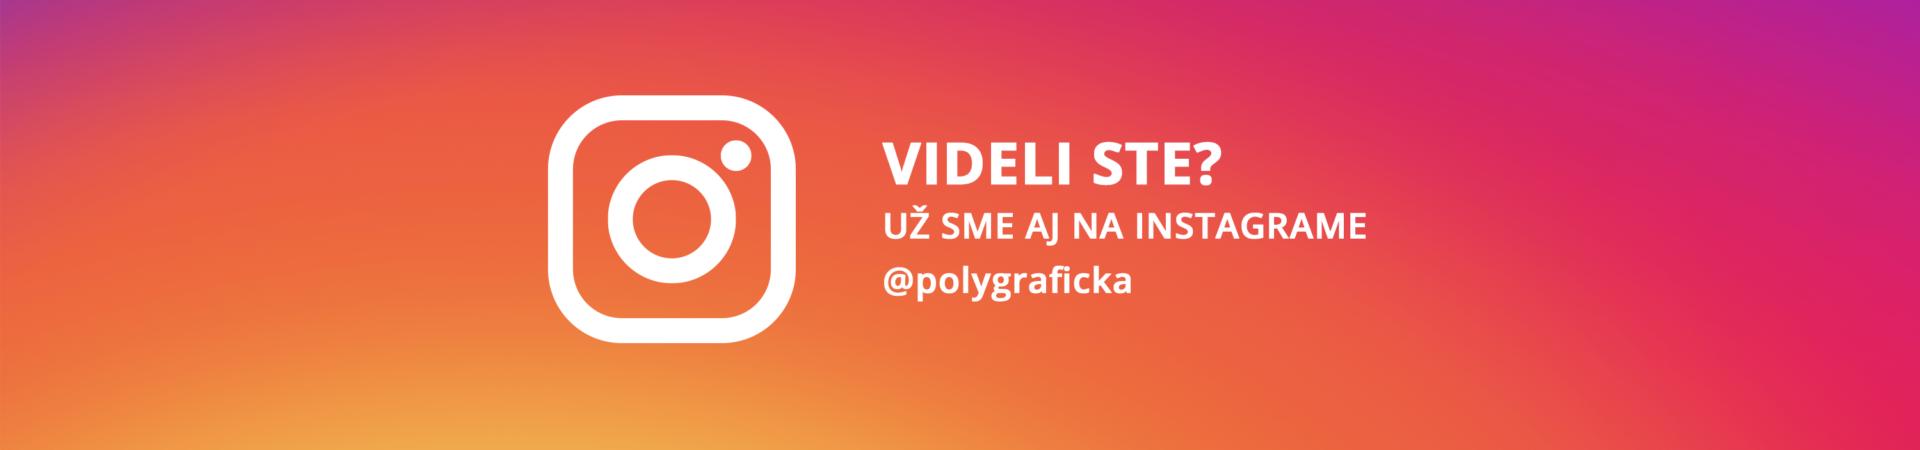 instagram polygraficka